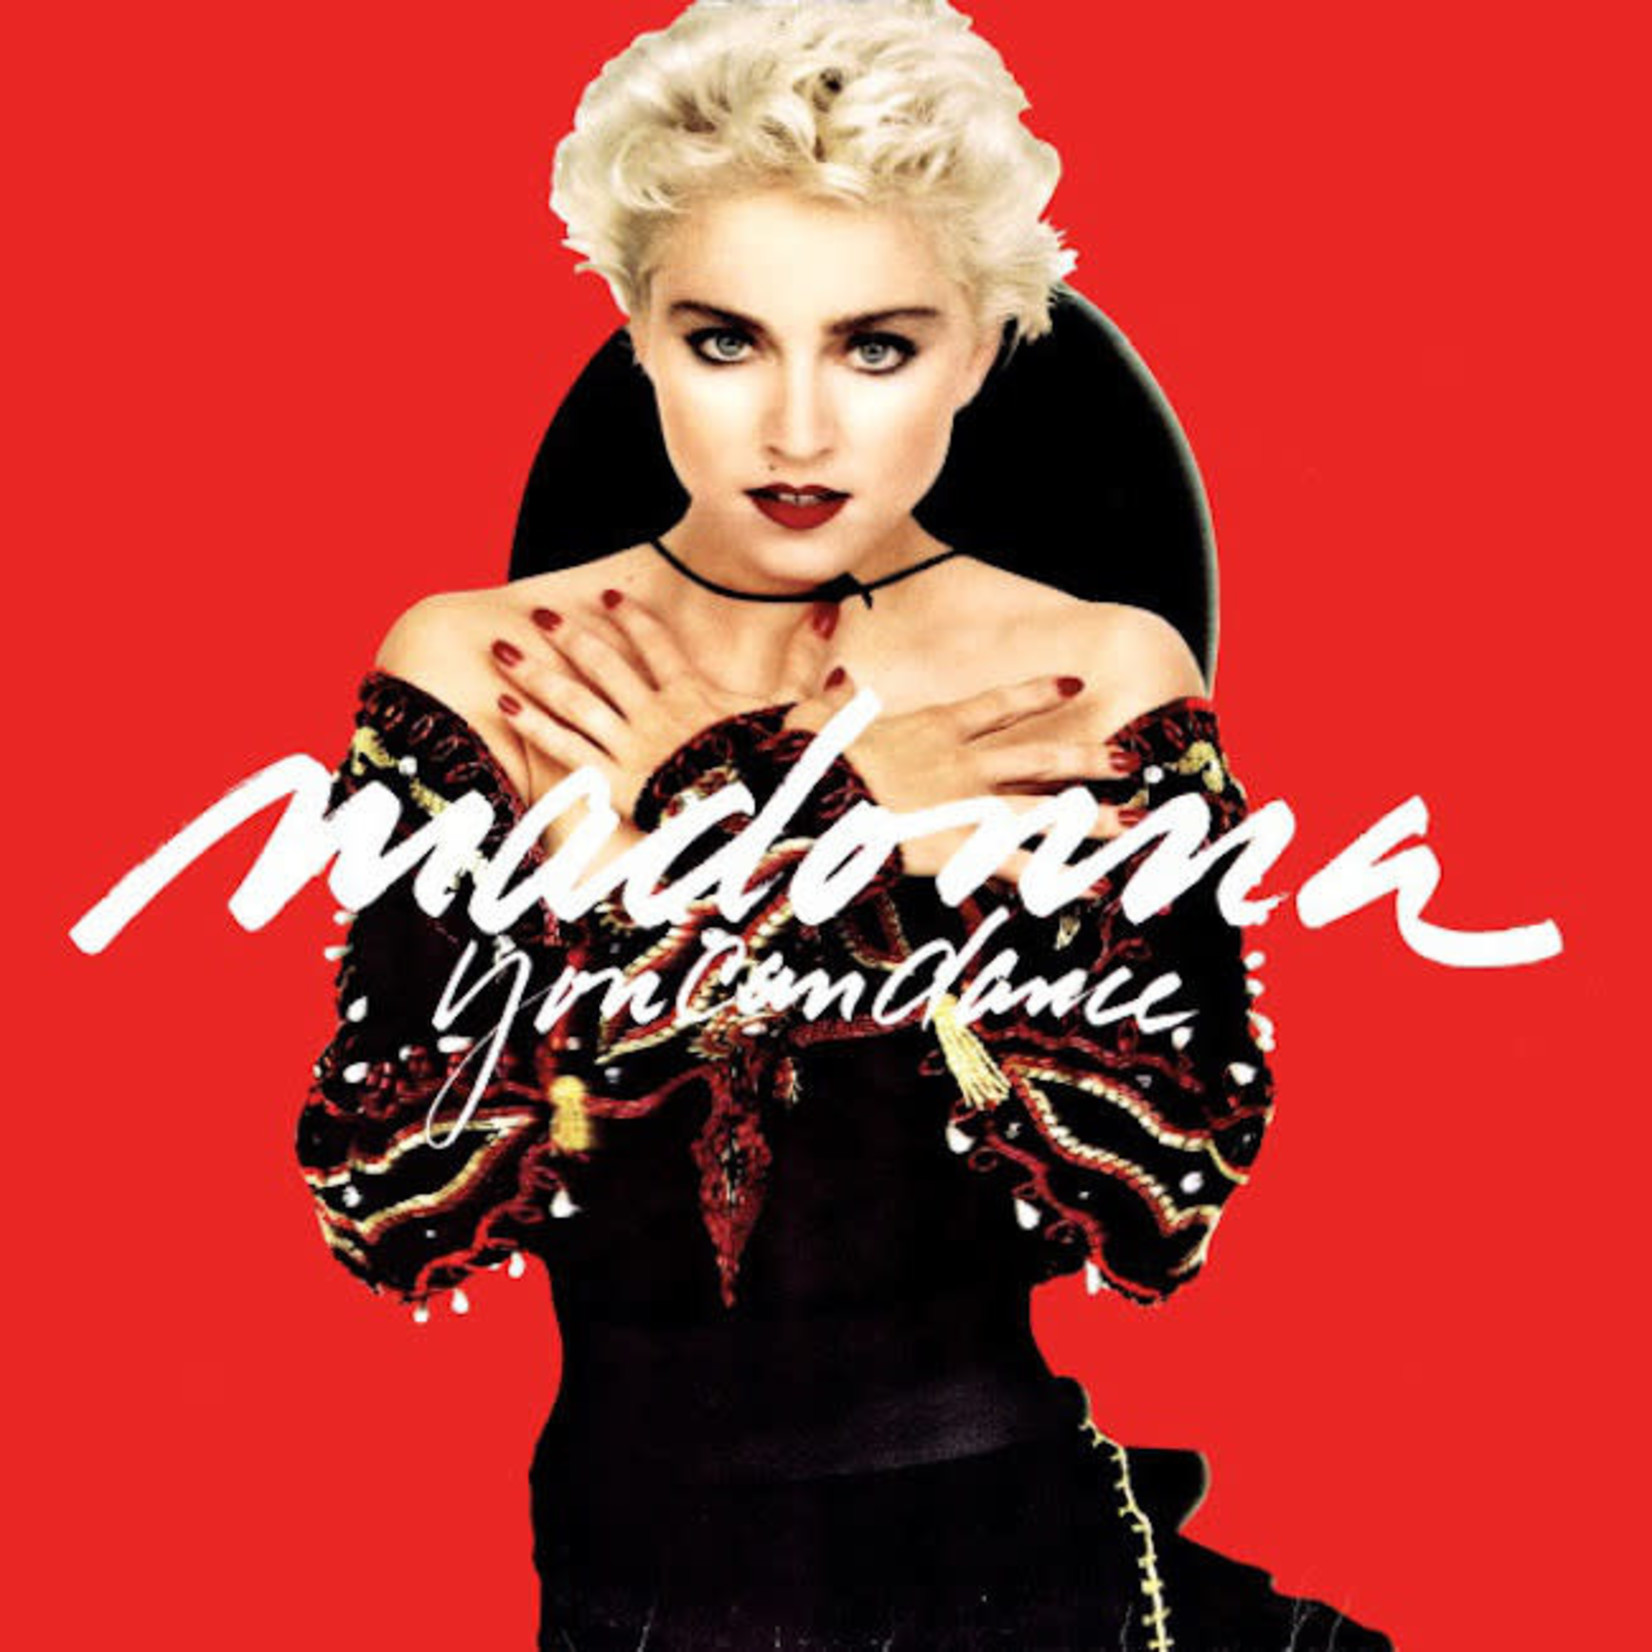 [Vintage] Madonna: You Can Dance